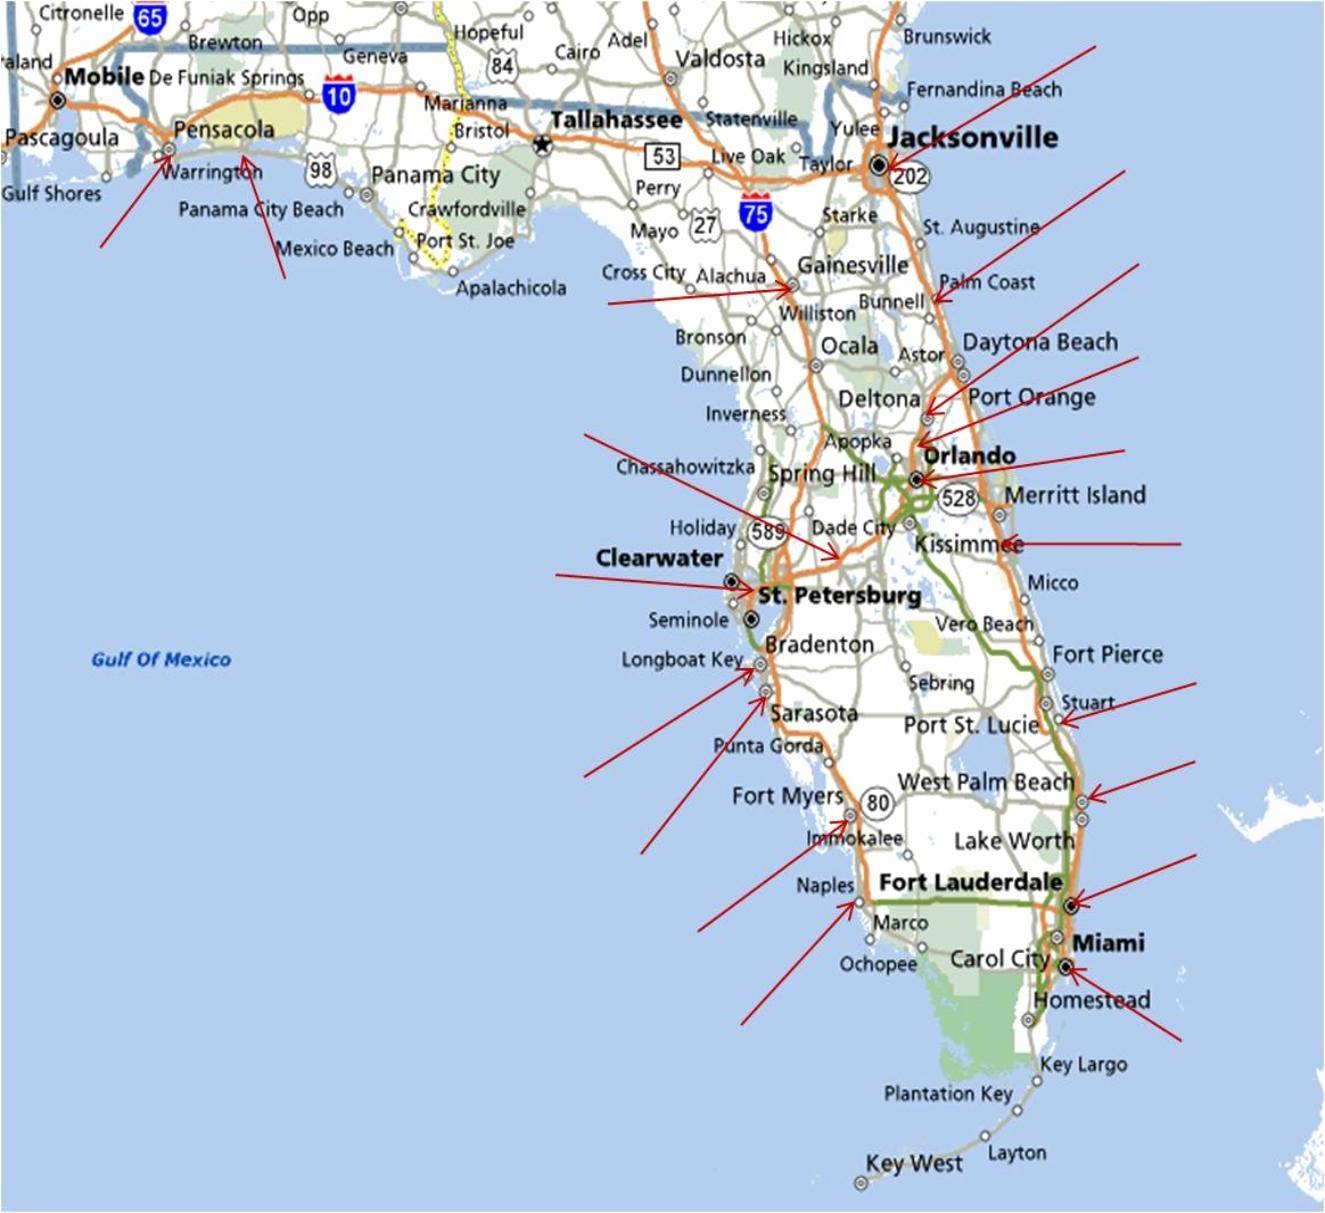 Best East Coast Florida Beaches New Map Florida West Coast Florida - Gulf Of Mexico Map Florida